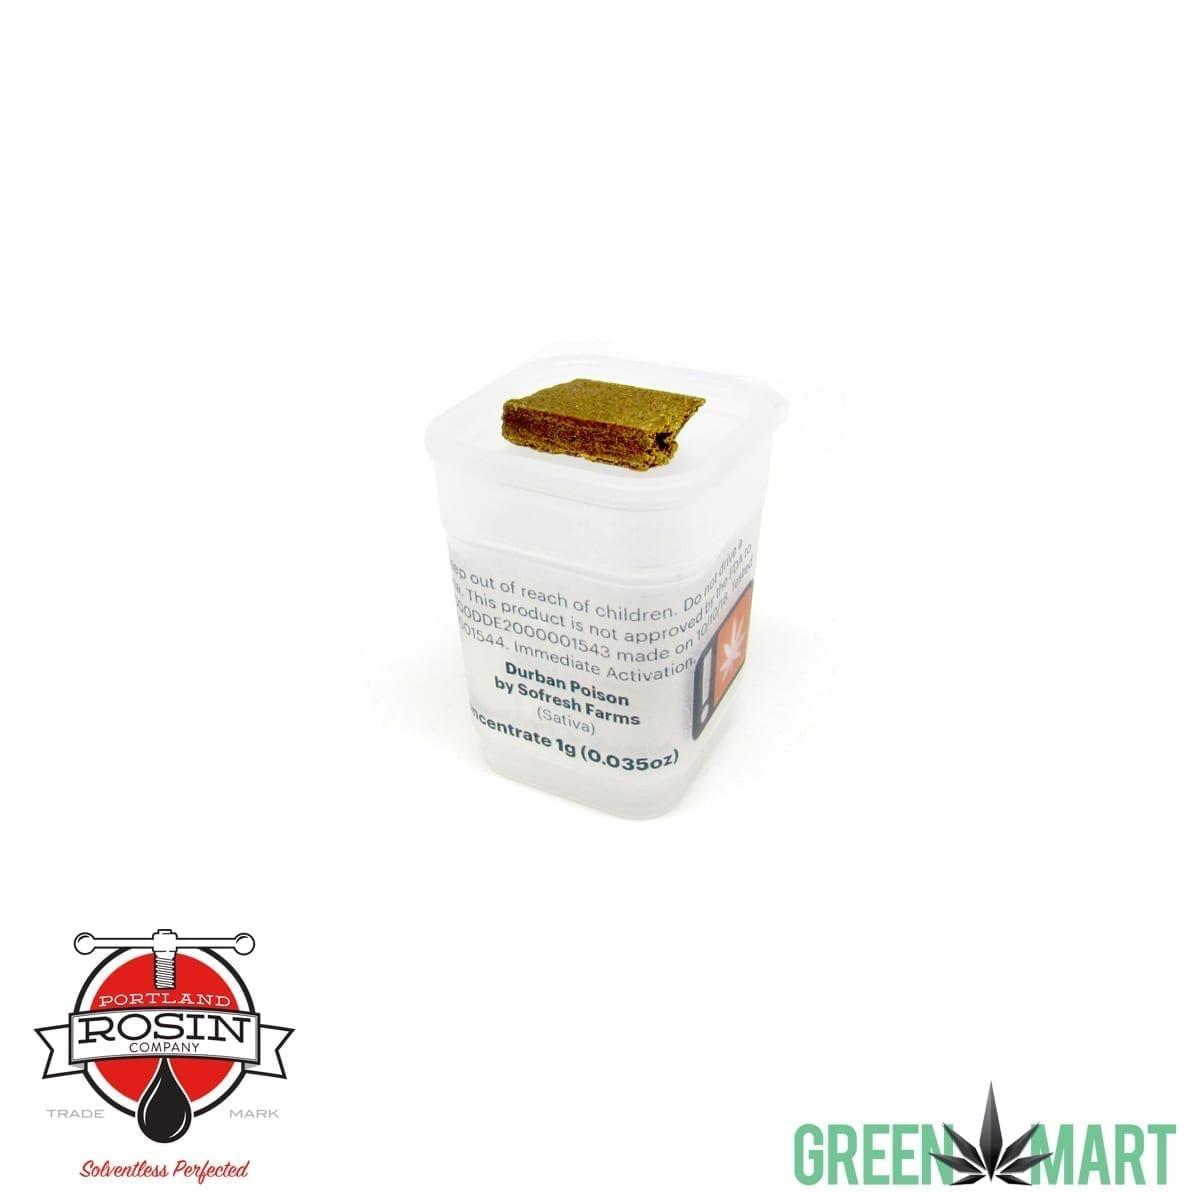 Portland Rosin Company - Durban Poison Hashish